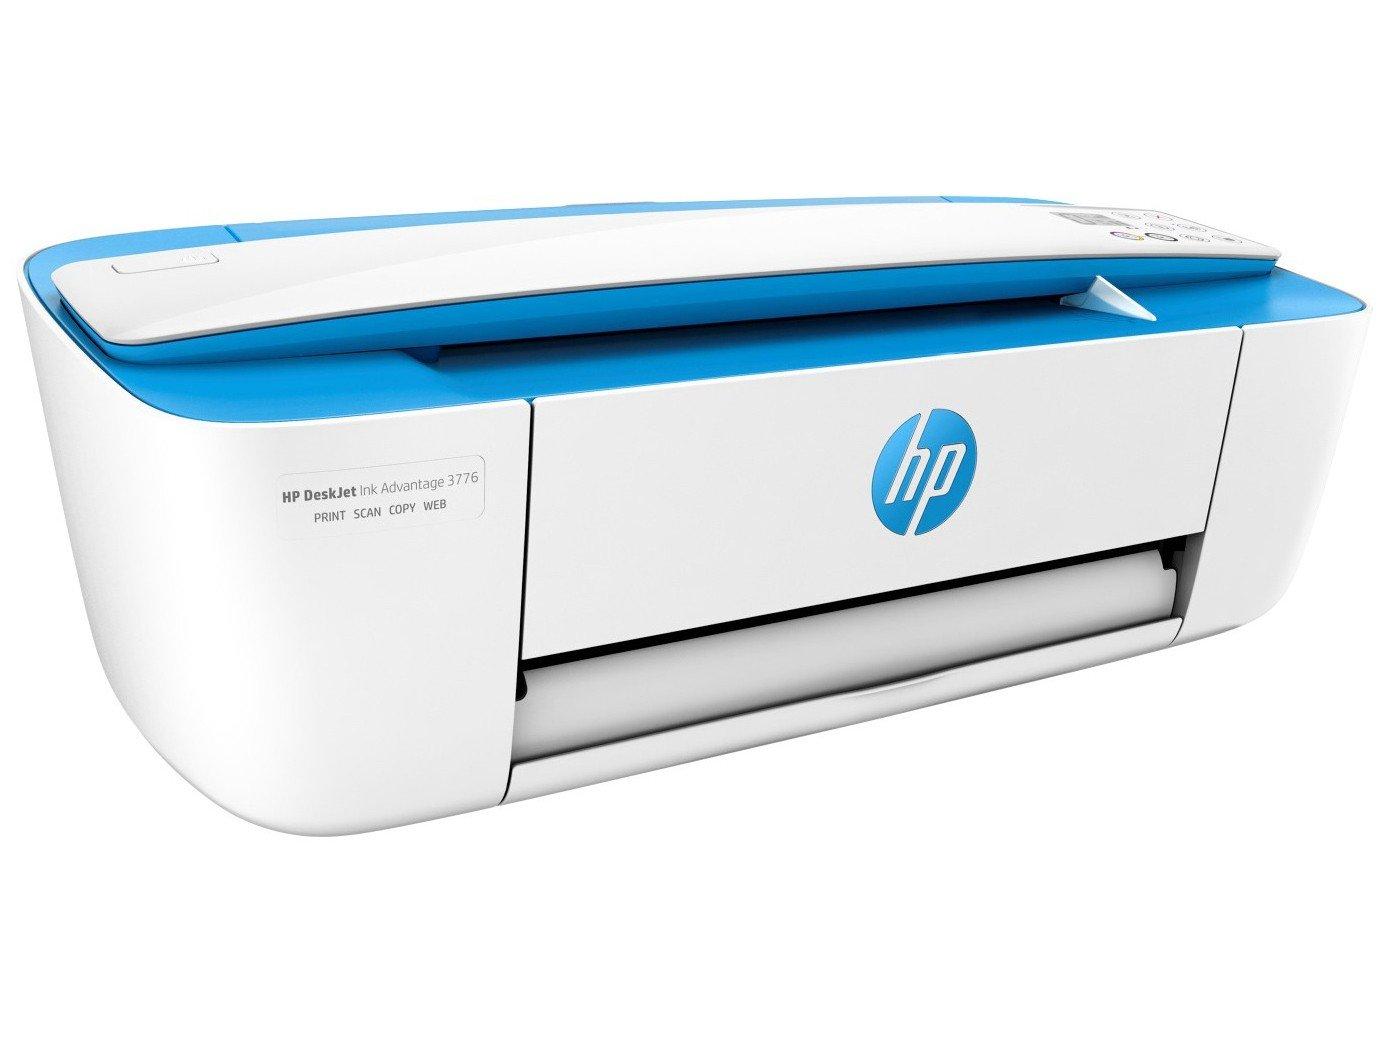 Foto 8 - Impressora Multifuncional HP - DeskJet Ink Advantage 3776 Jato de Tinta Wi-Fi